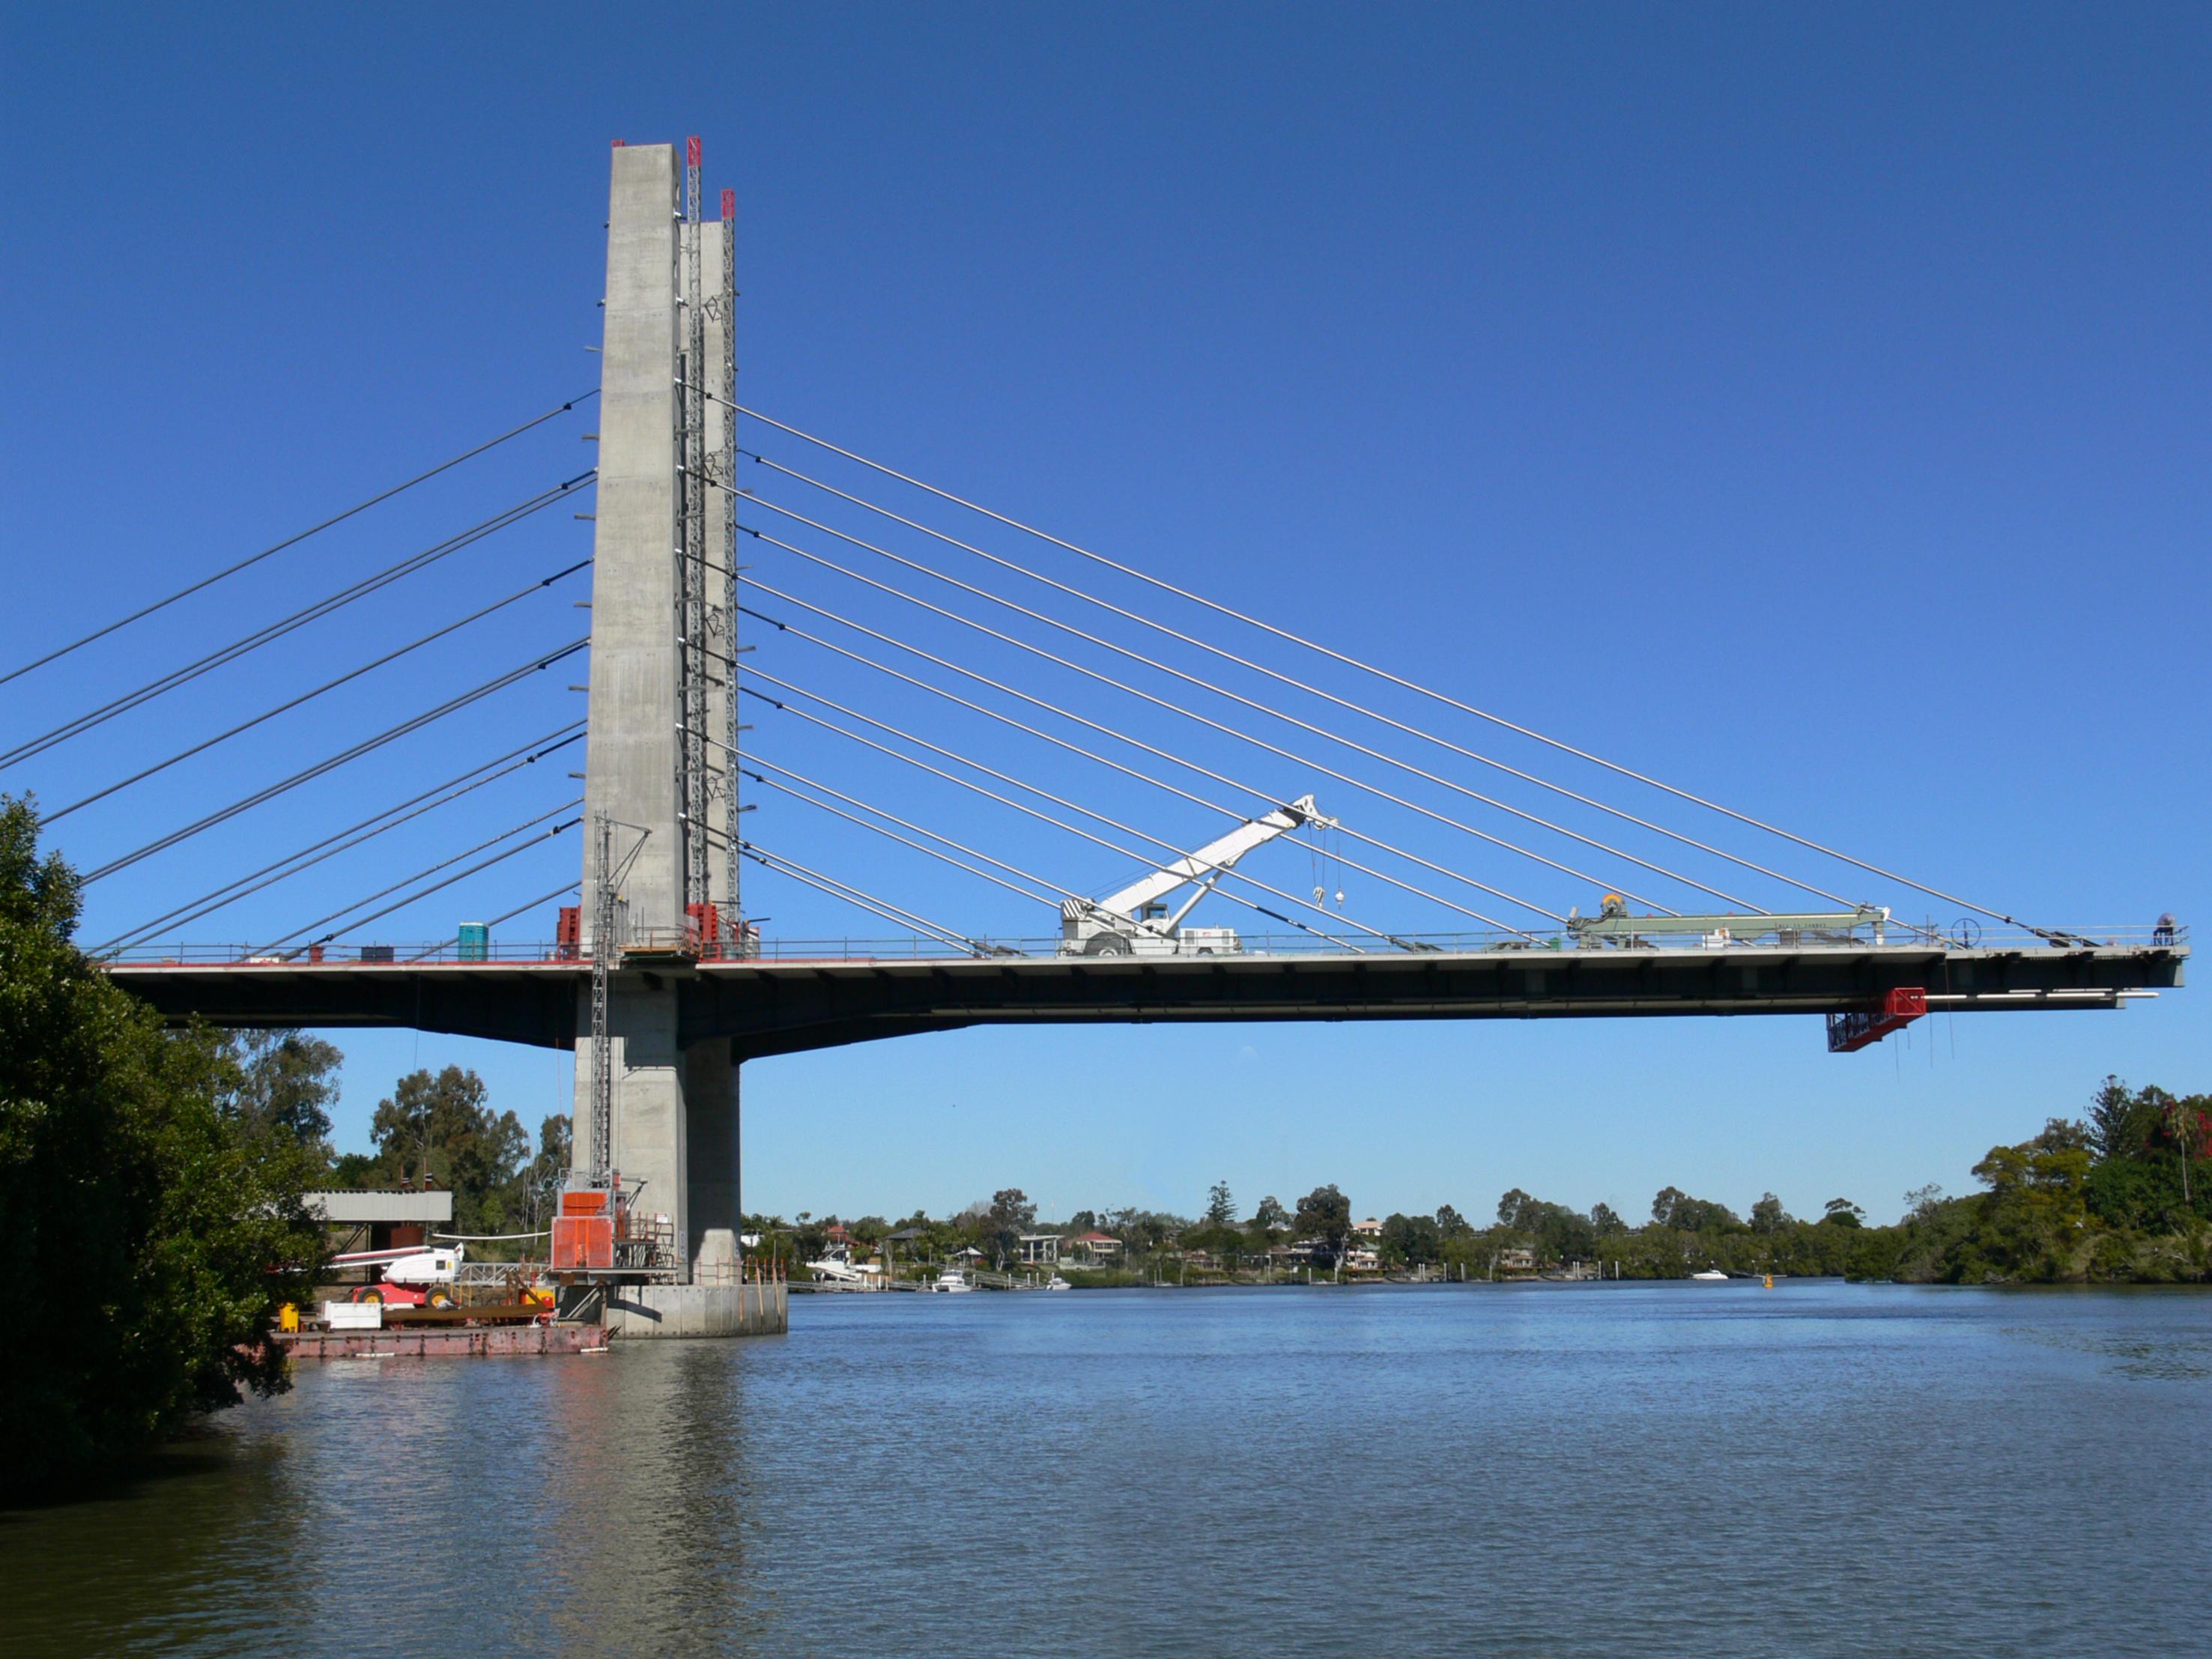 bridge(shutterstock)